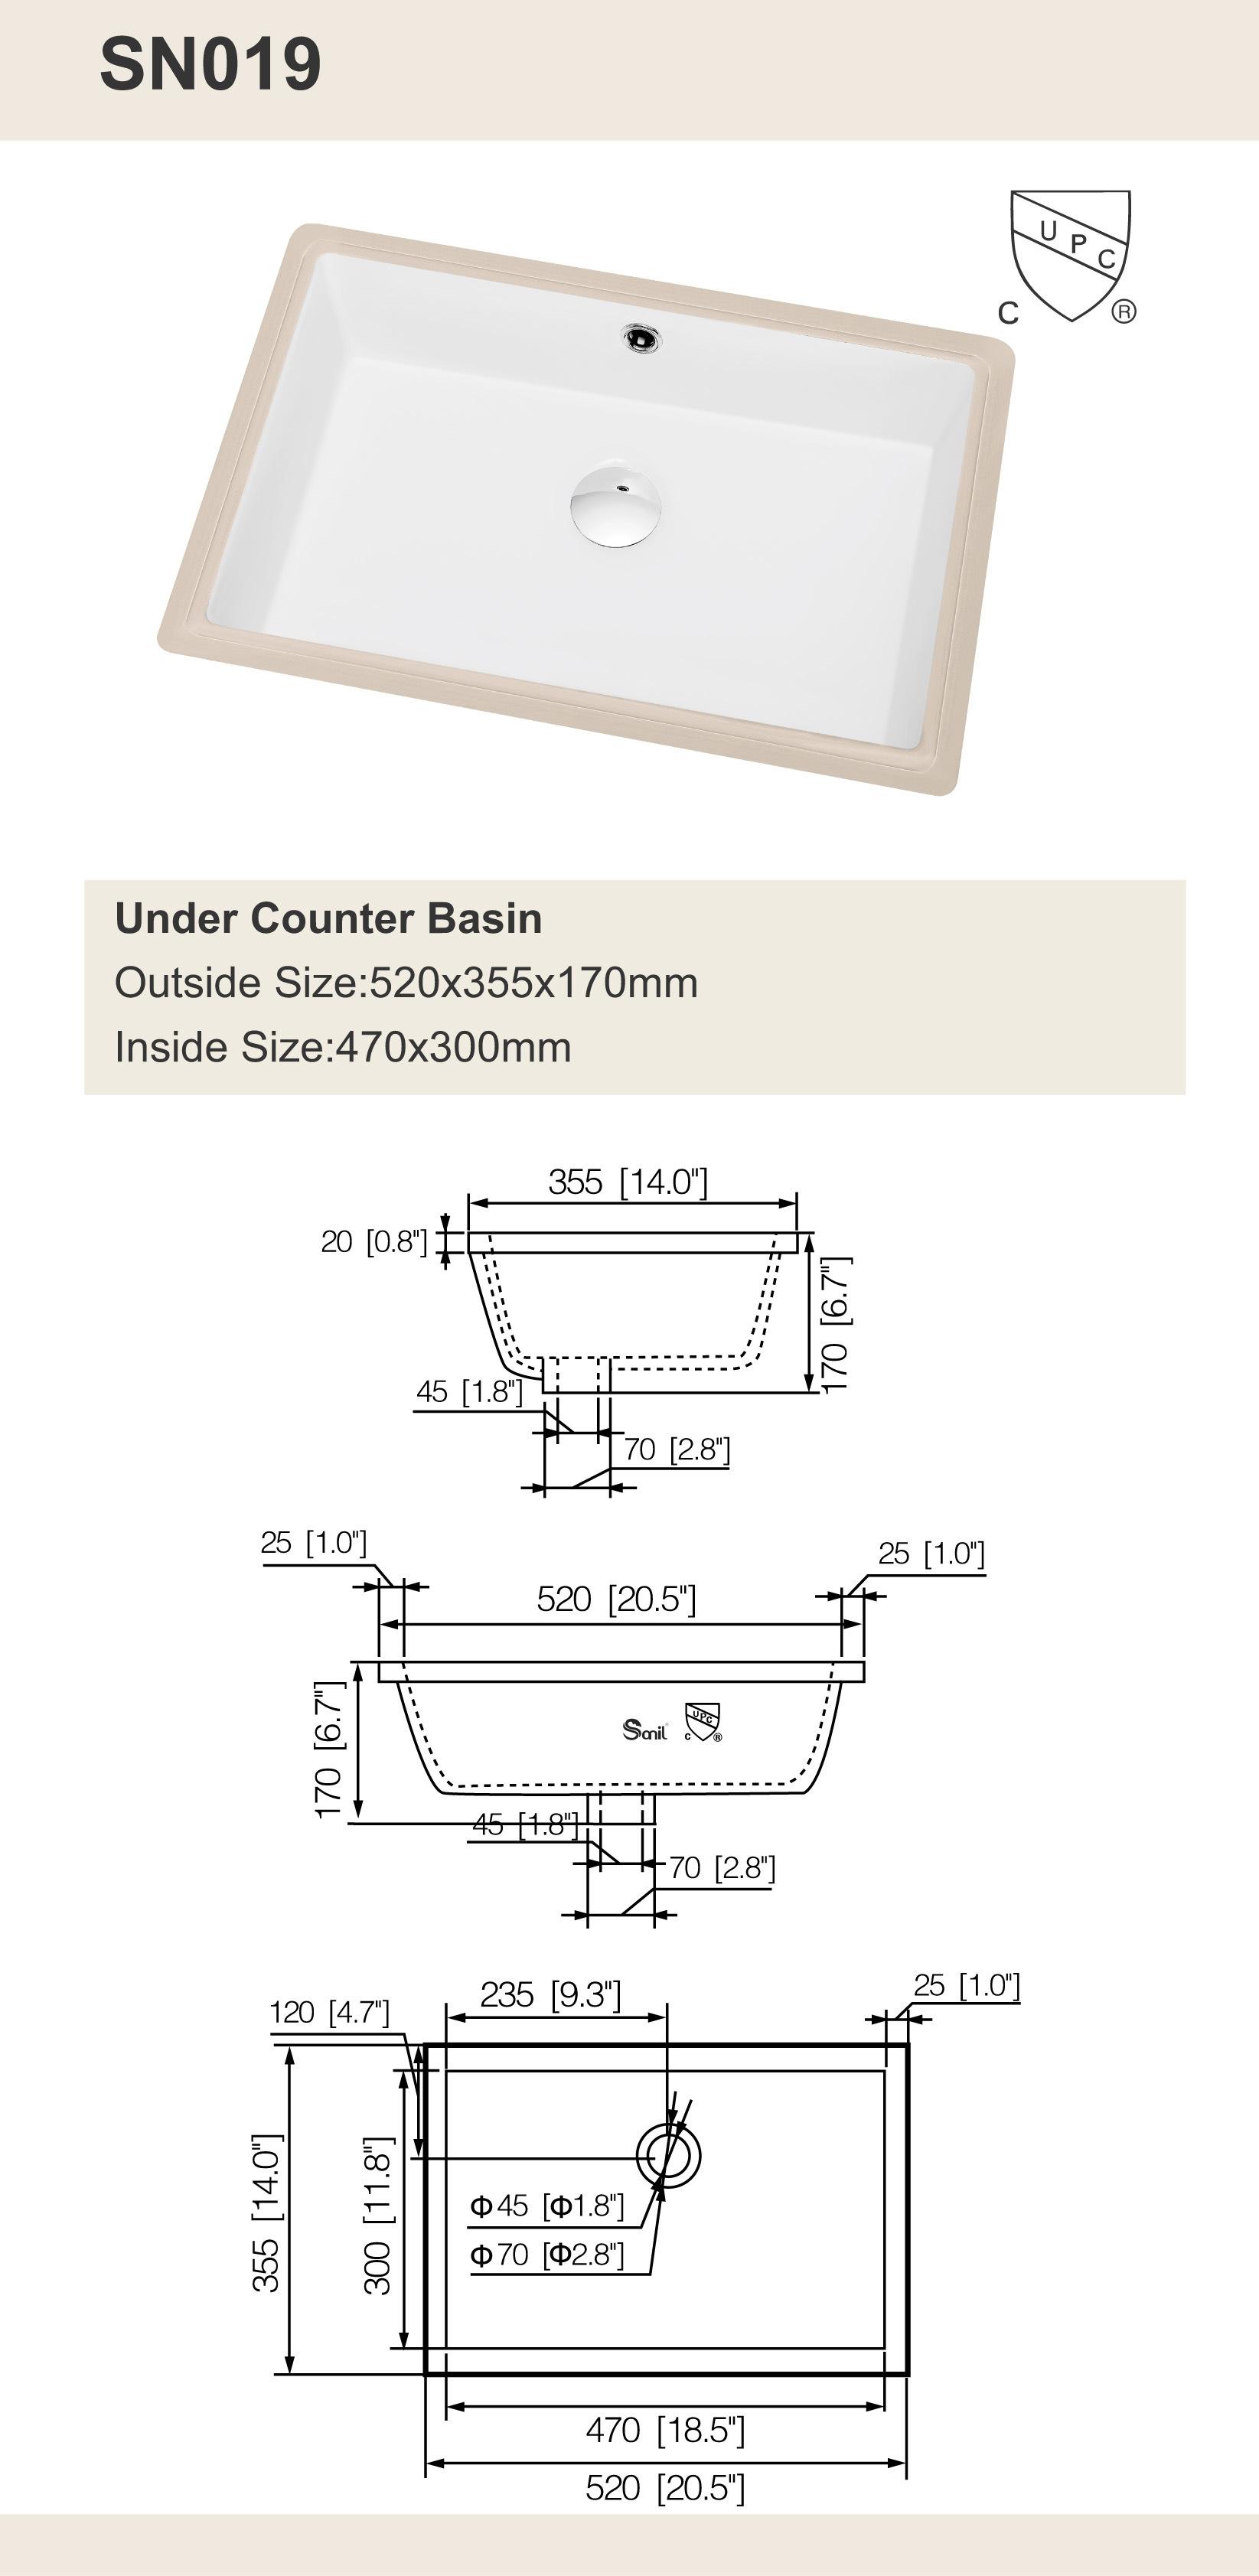 USA Canada Hot Selling Cupc Undermount Ceramic Bathroom Basins (SN019)